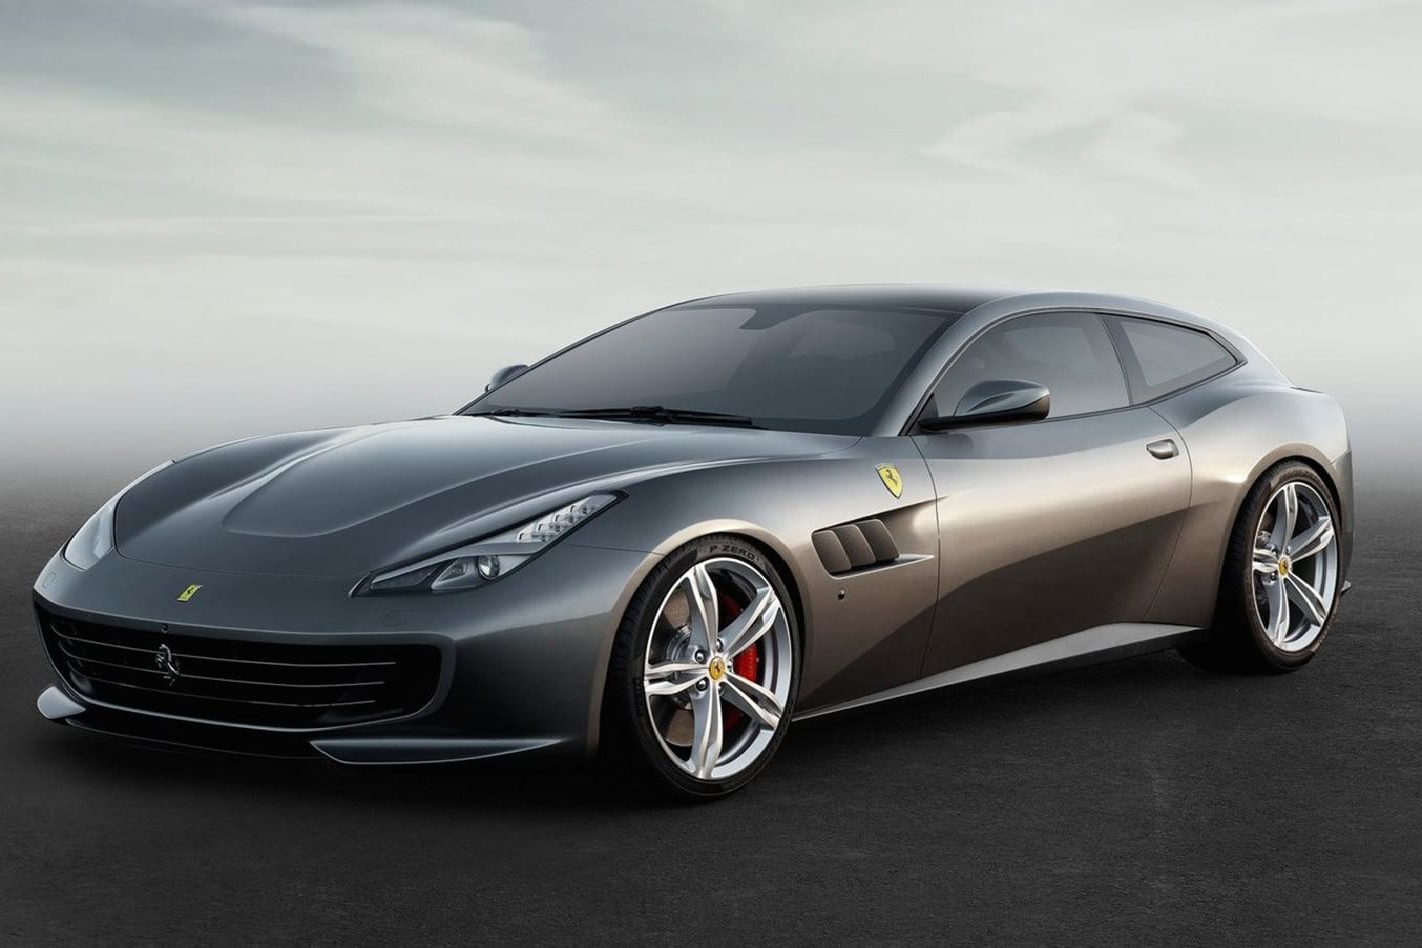 Ferrari GTC4 Lusso revealed